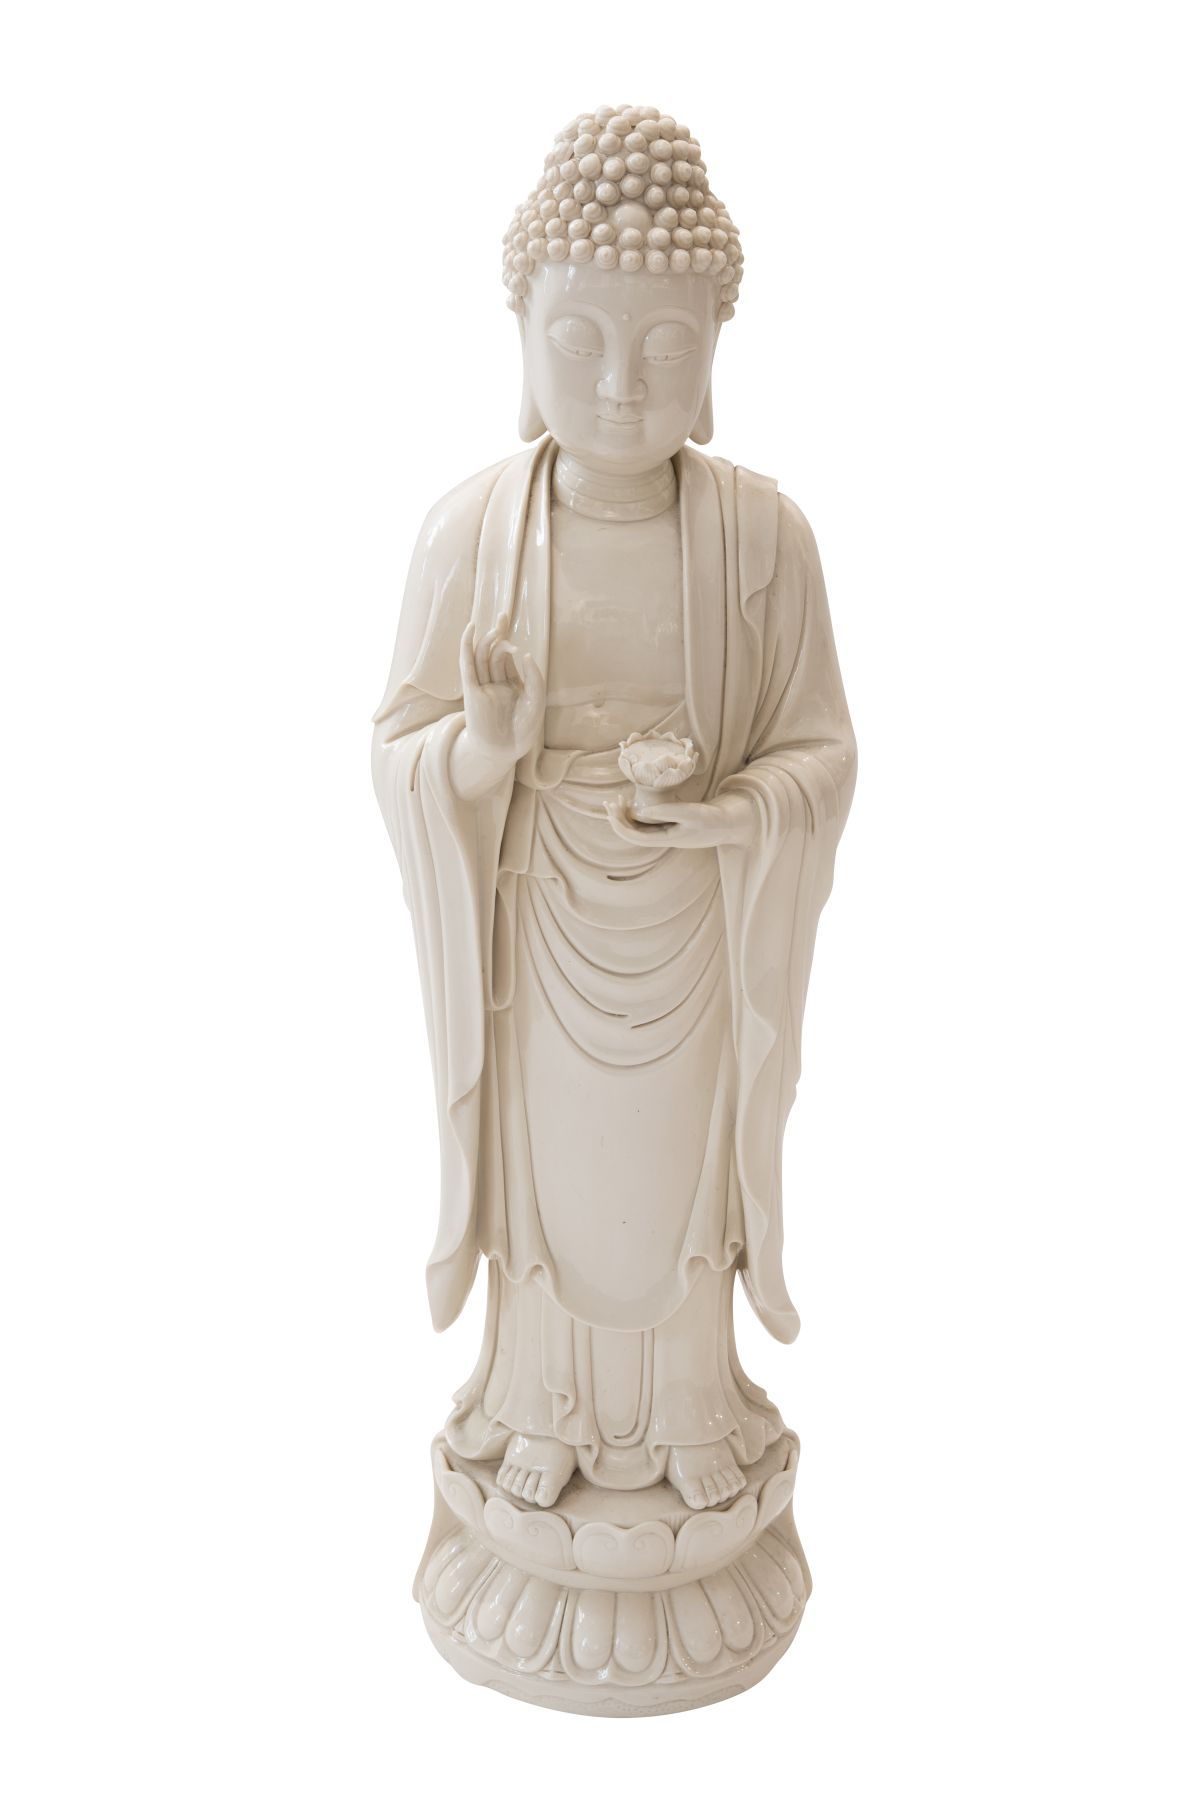 "#175 Blanc de Chine ""Guanyin"", porcelain figure | Blanc de Chine ""Guanyin"", Porzellanfigur Image"